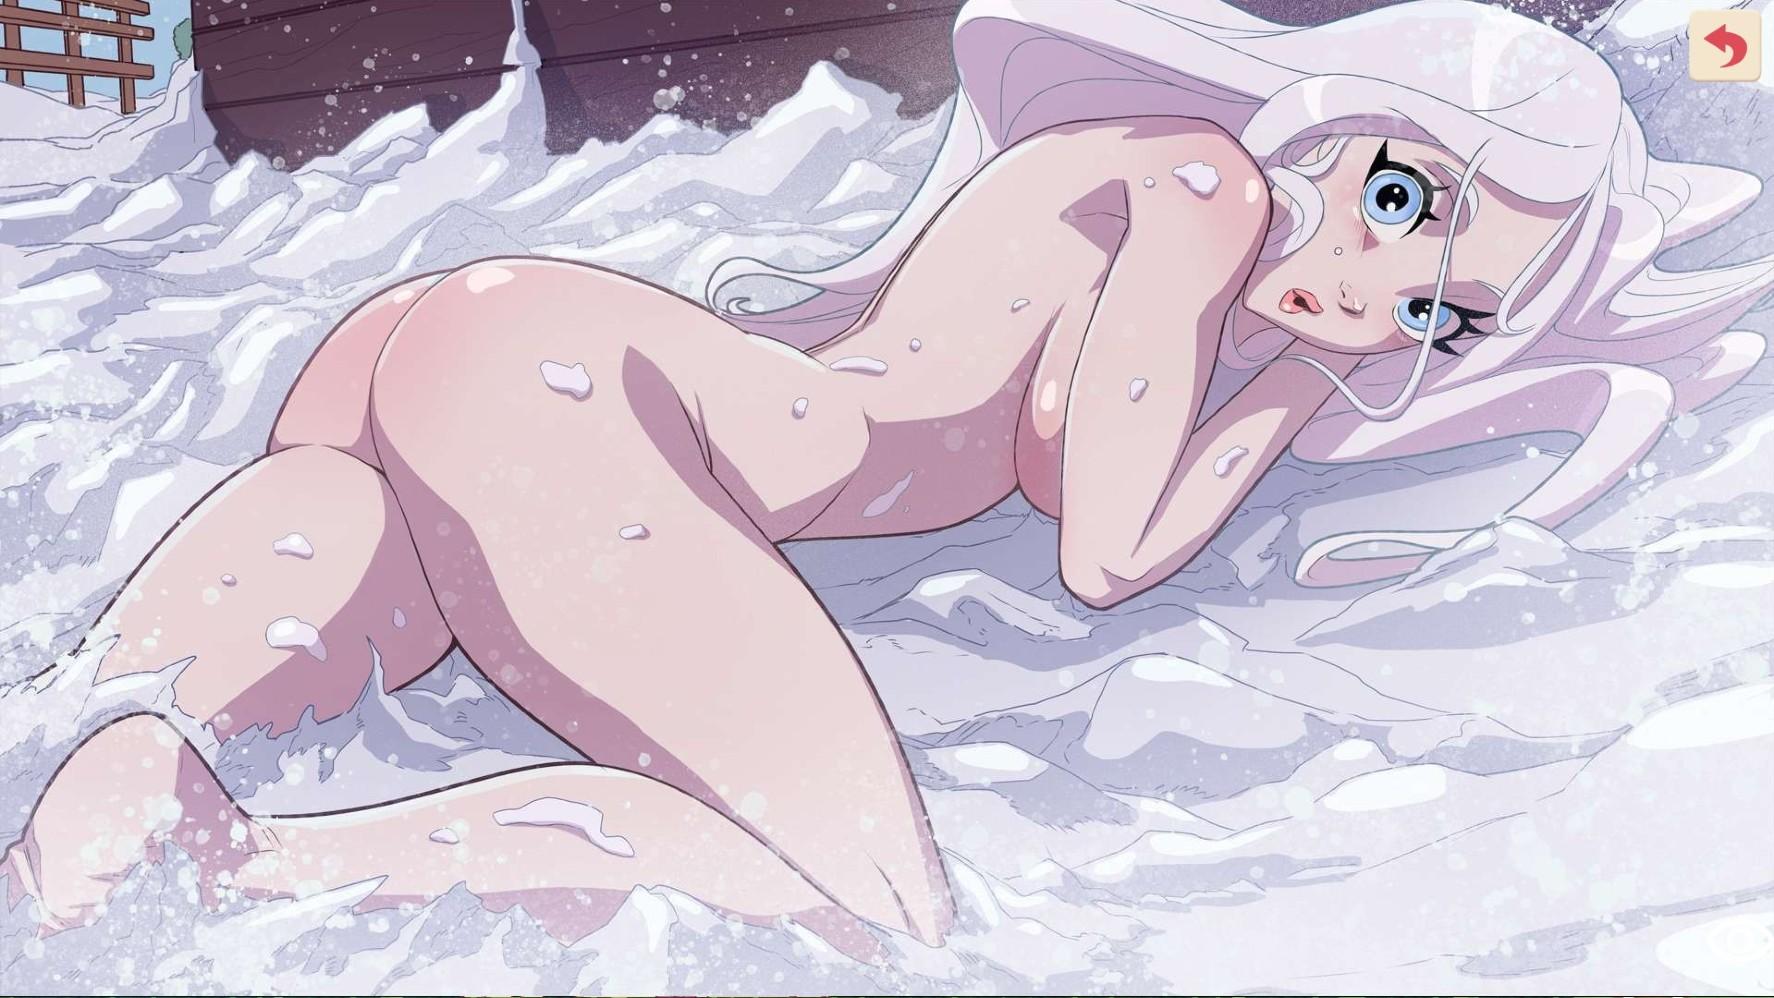 (18+)Booty Farm (MOD APK, Unlimited Coins/ Gems) v7.5 2